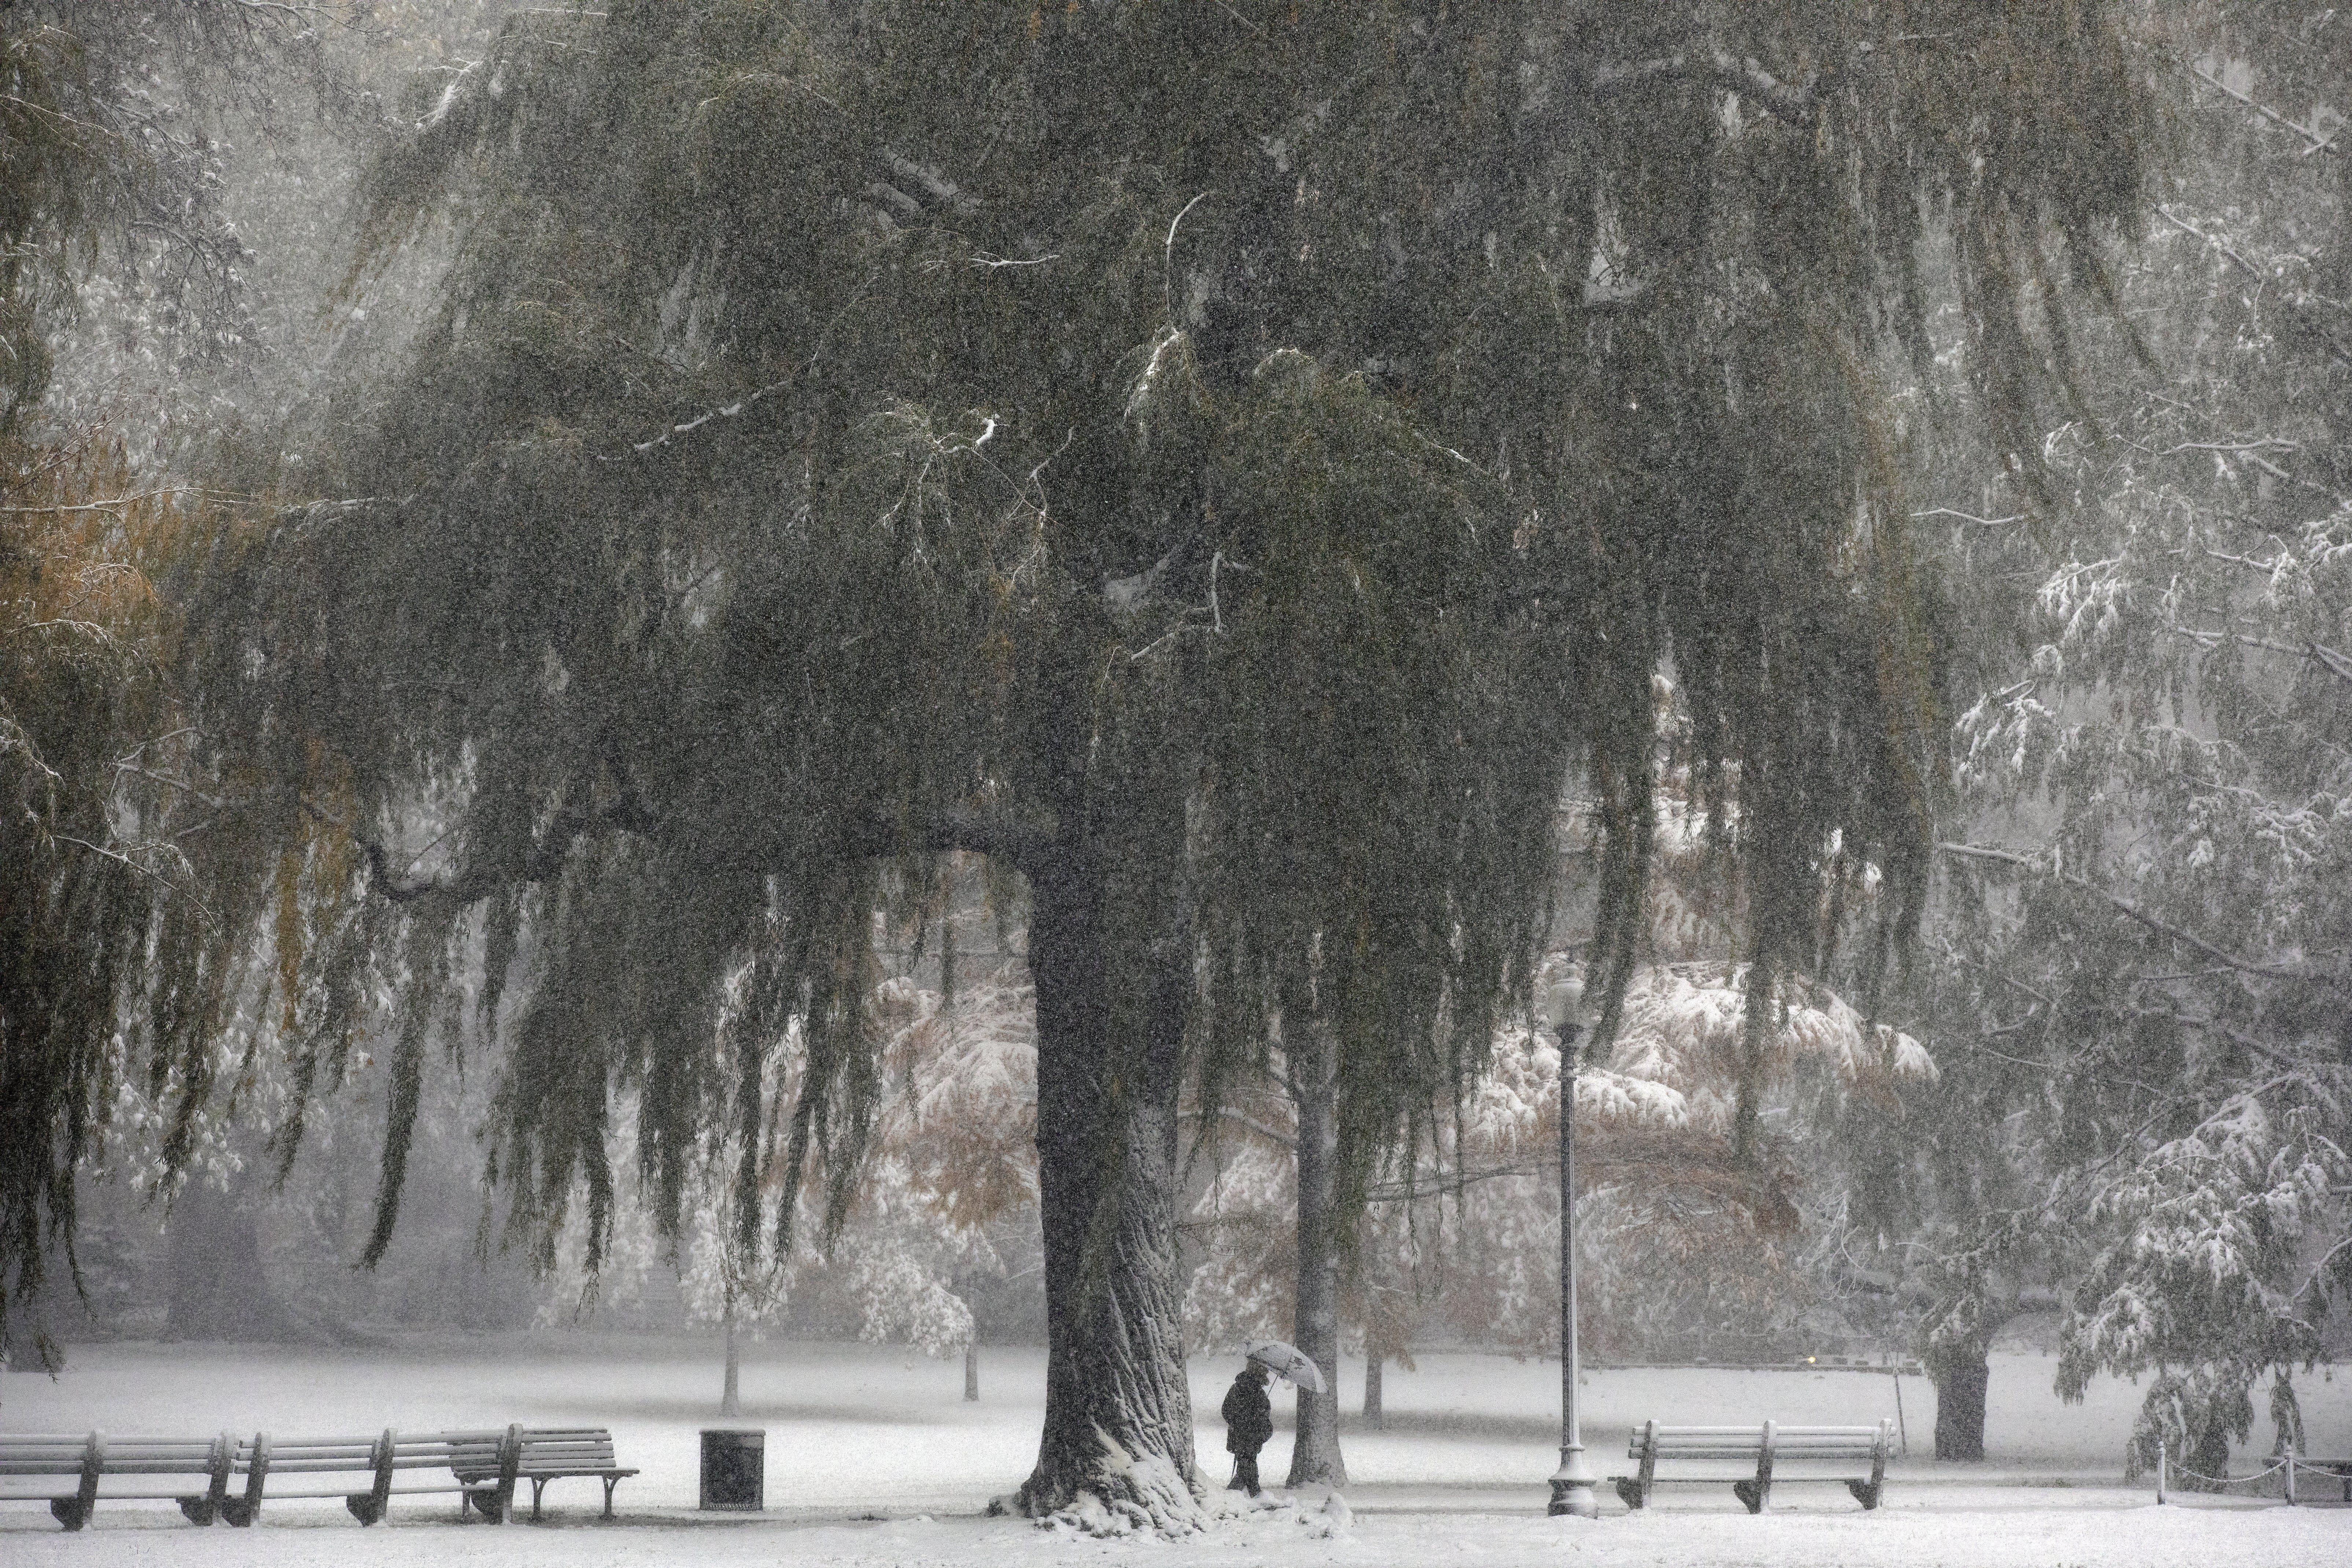 Snow falls on the Public Garden, Friday, Oct. 30, 2020, in Boston. (AP Photo/Michael Dwyer)